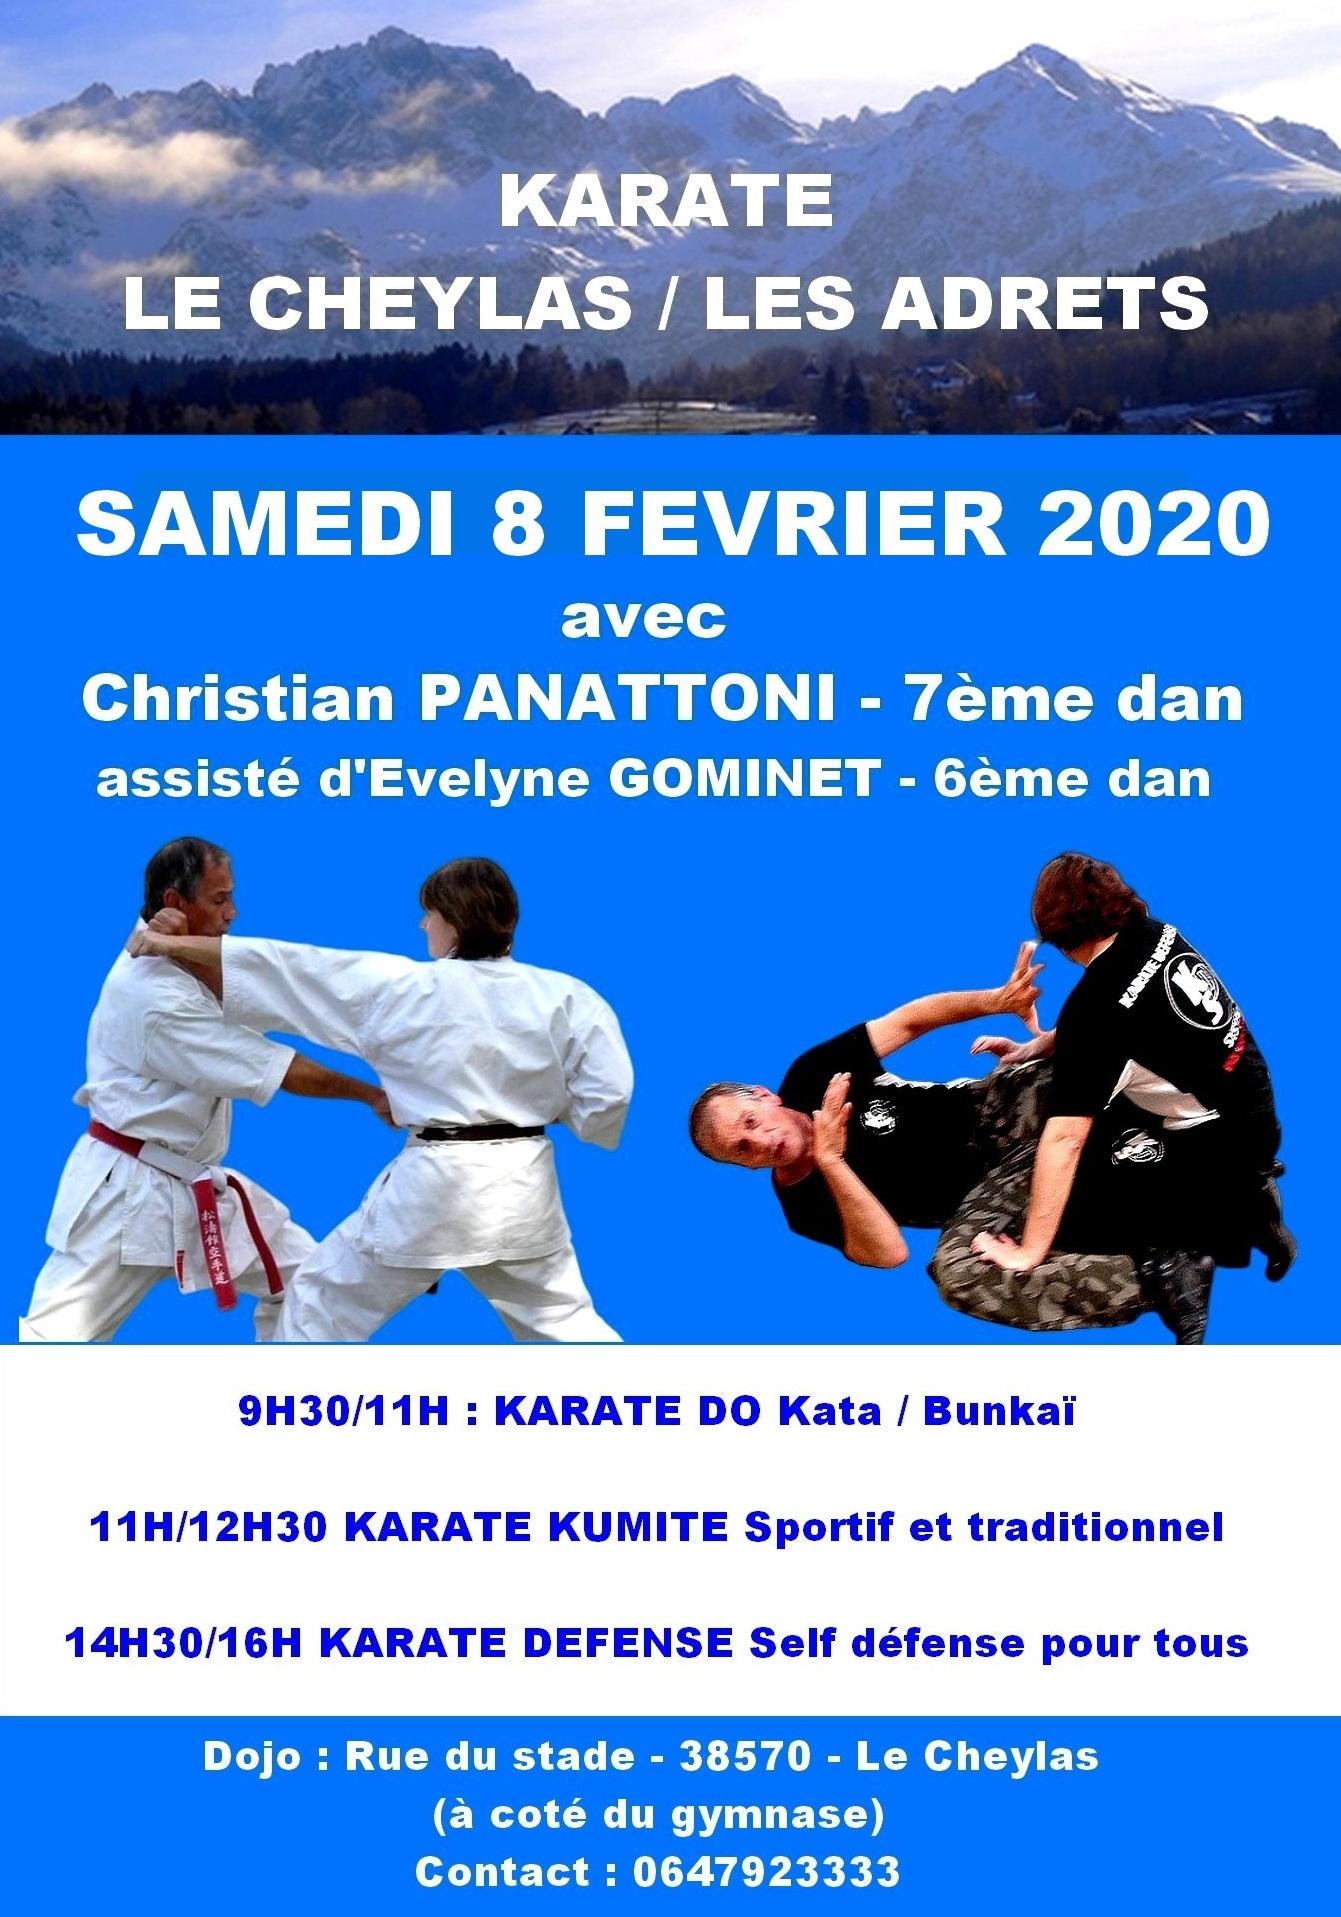 Affiche 20le 20cheylas 20fev 202020 jpg 2